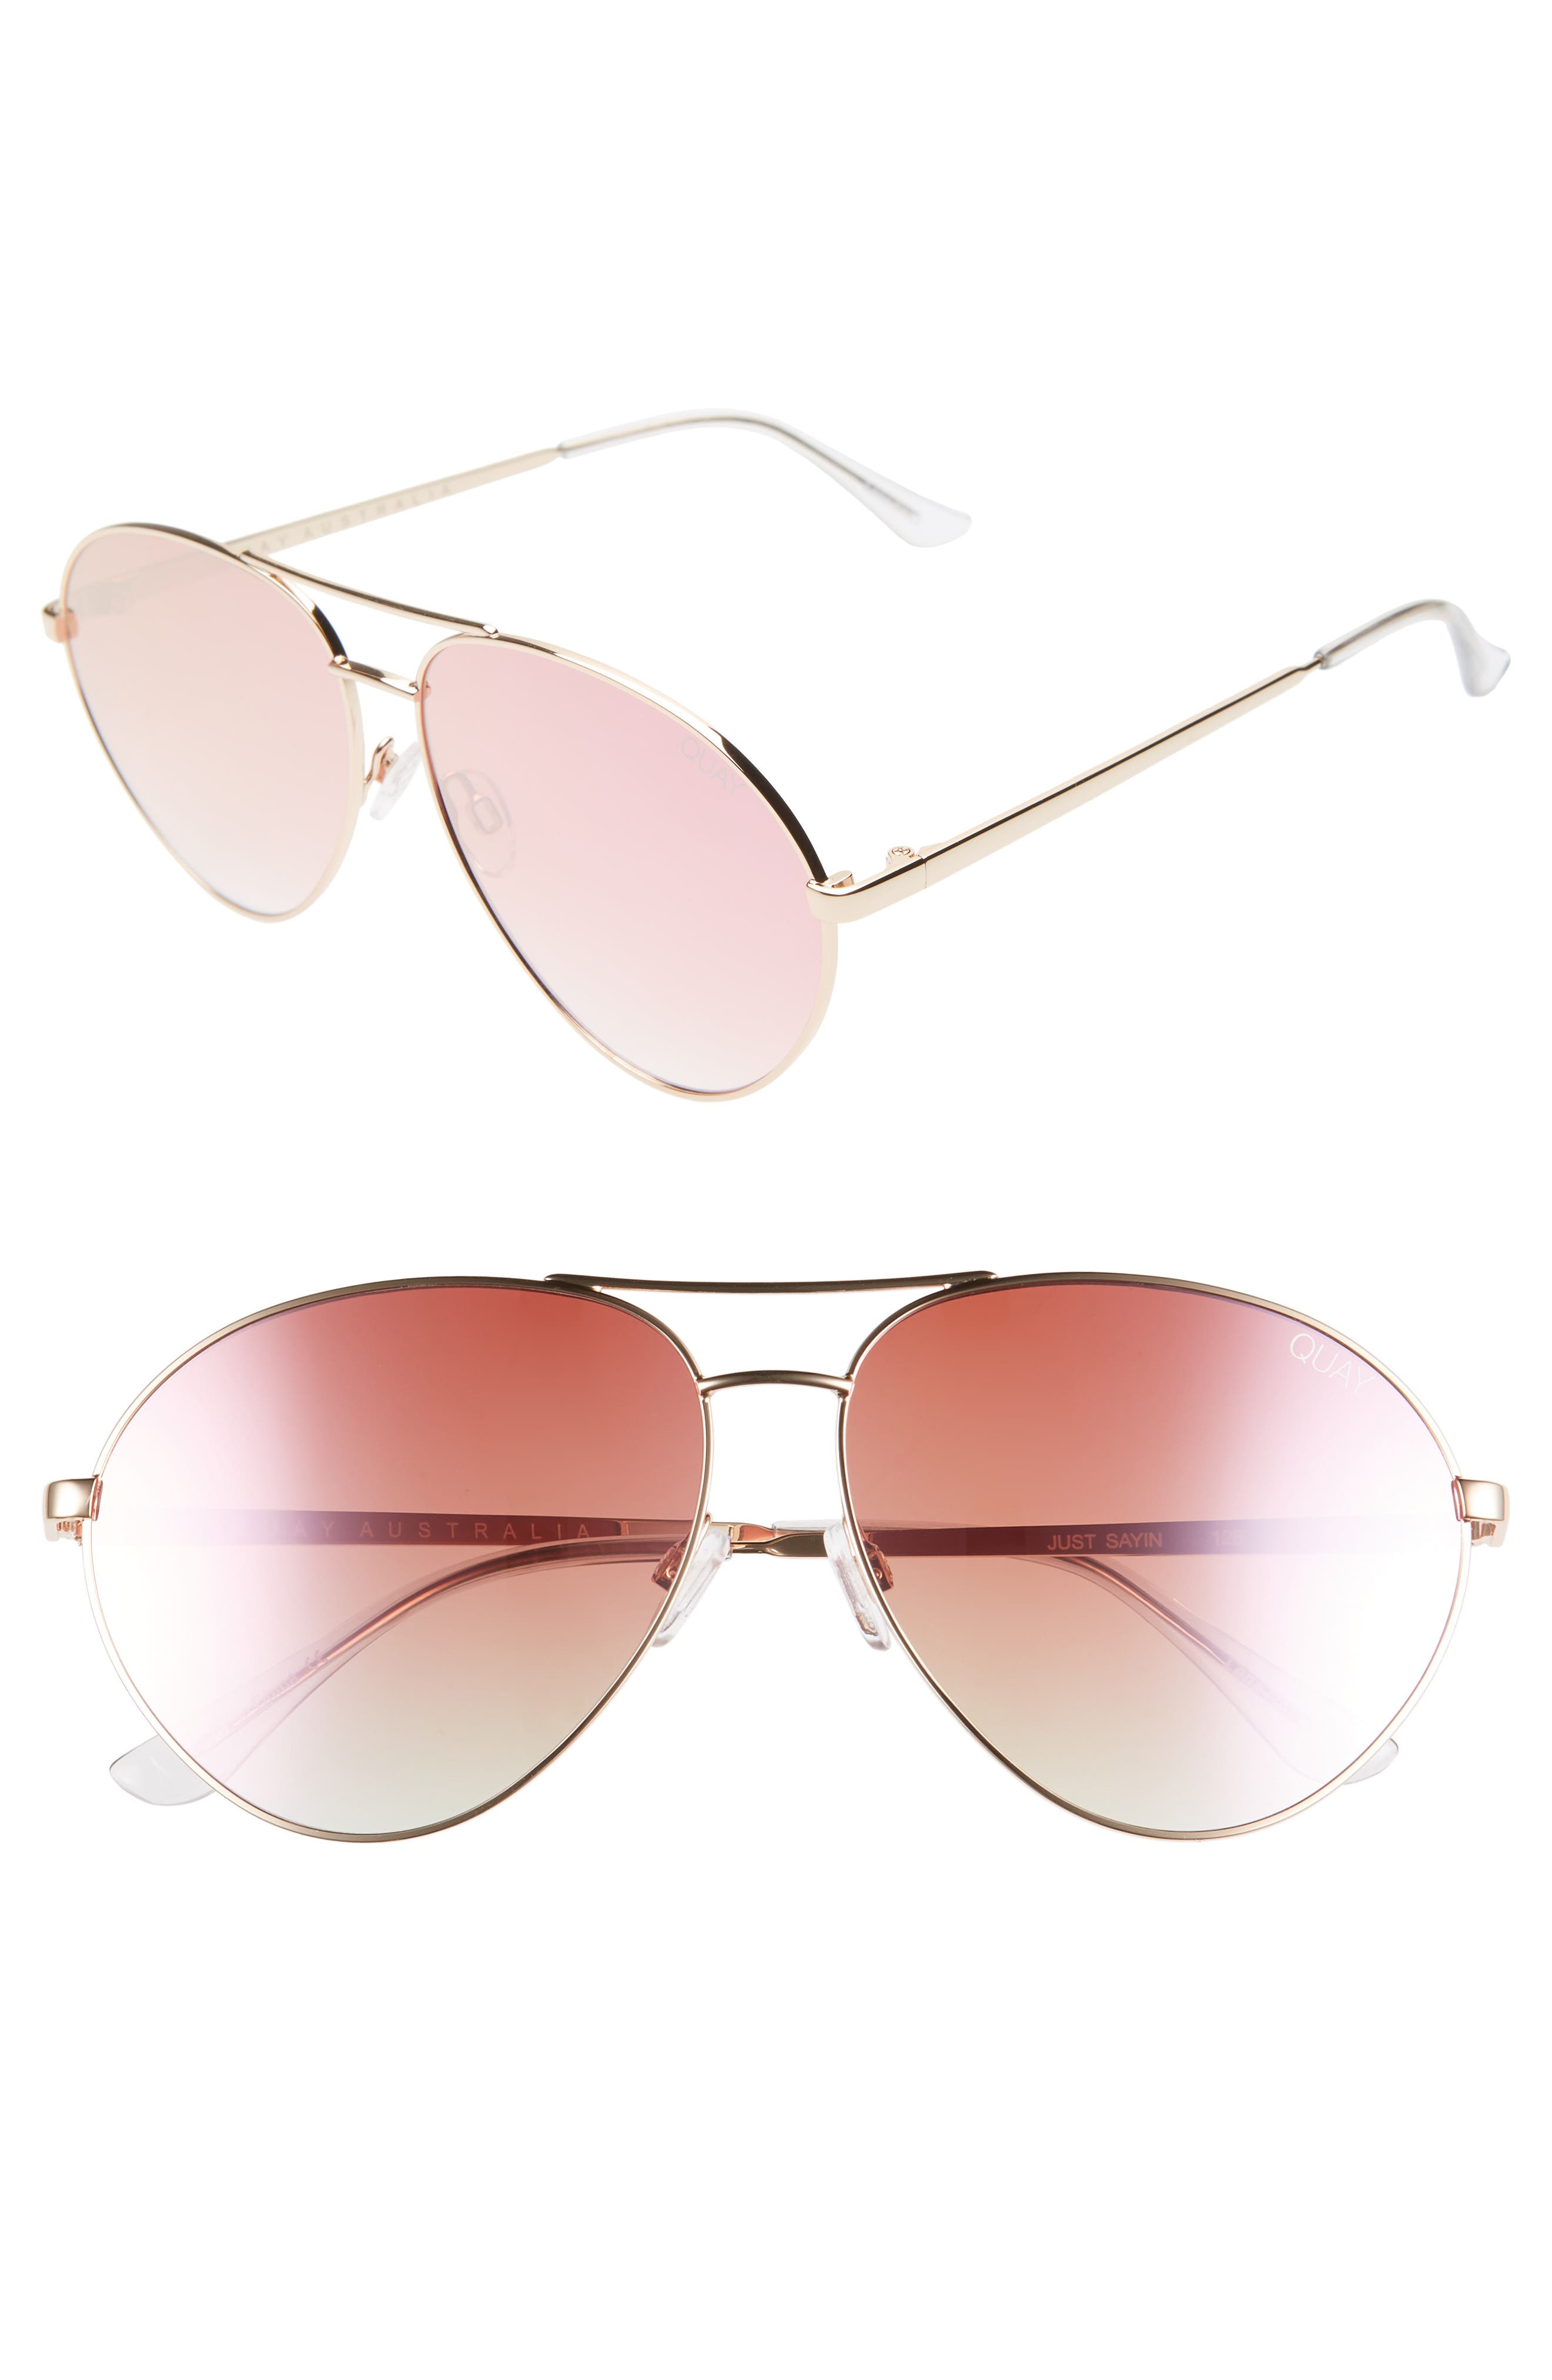 Quay Australia Just Sayin 5m Aviator Sunglasses - Gold/ Pink